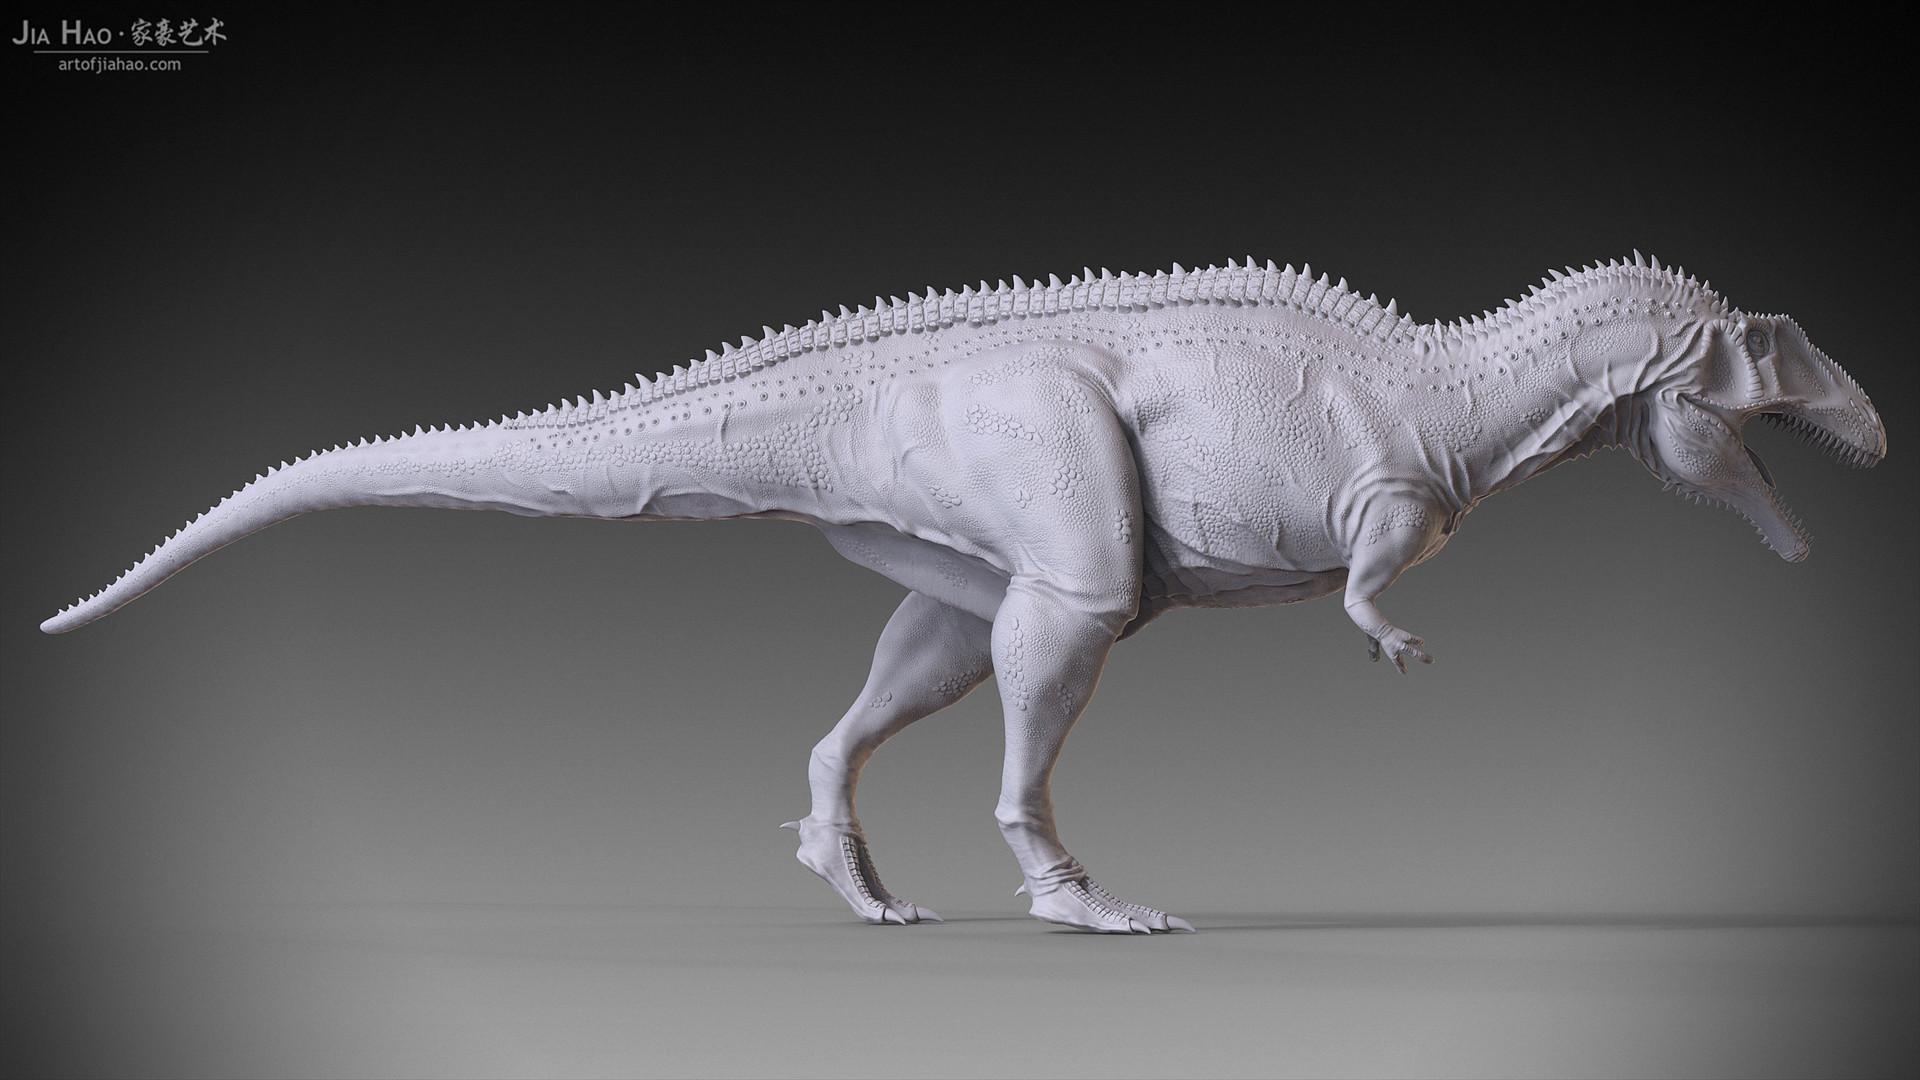 Jia hao acrocanthosaurus 02